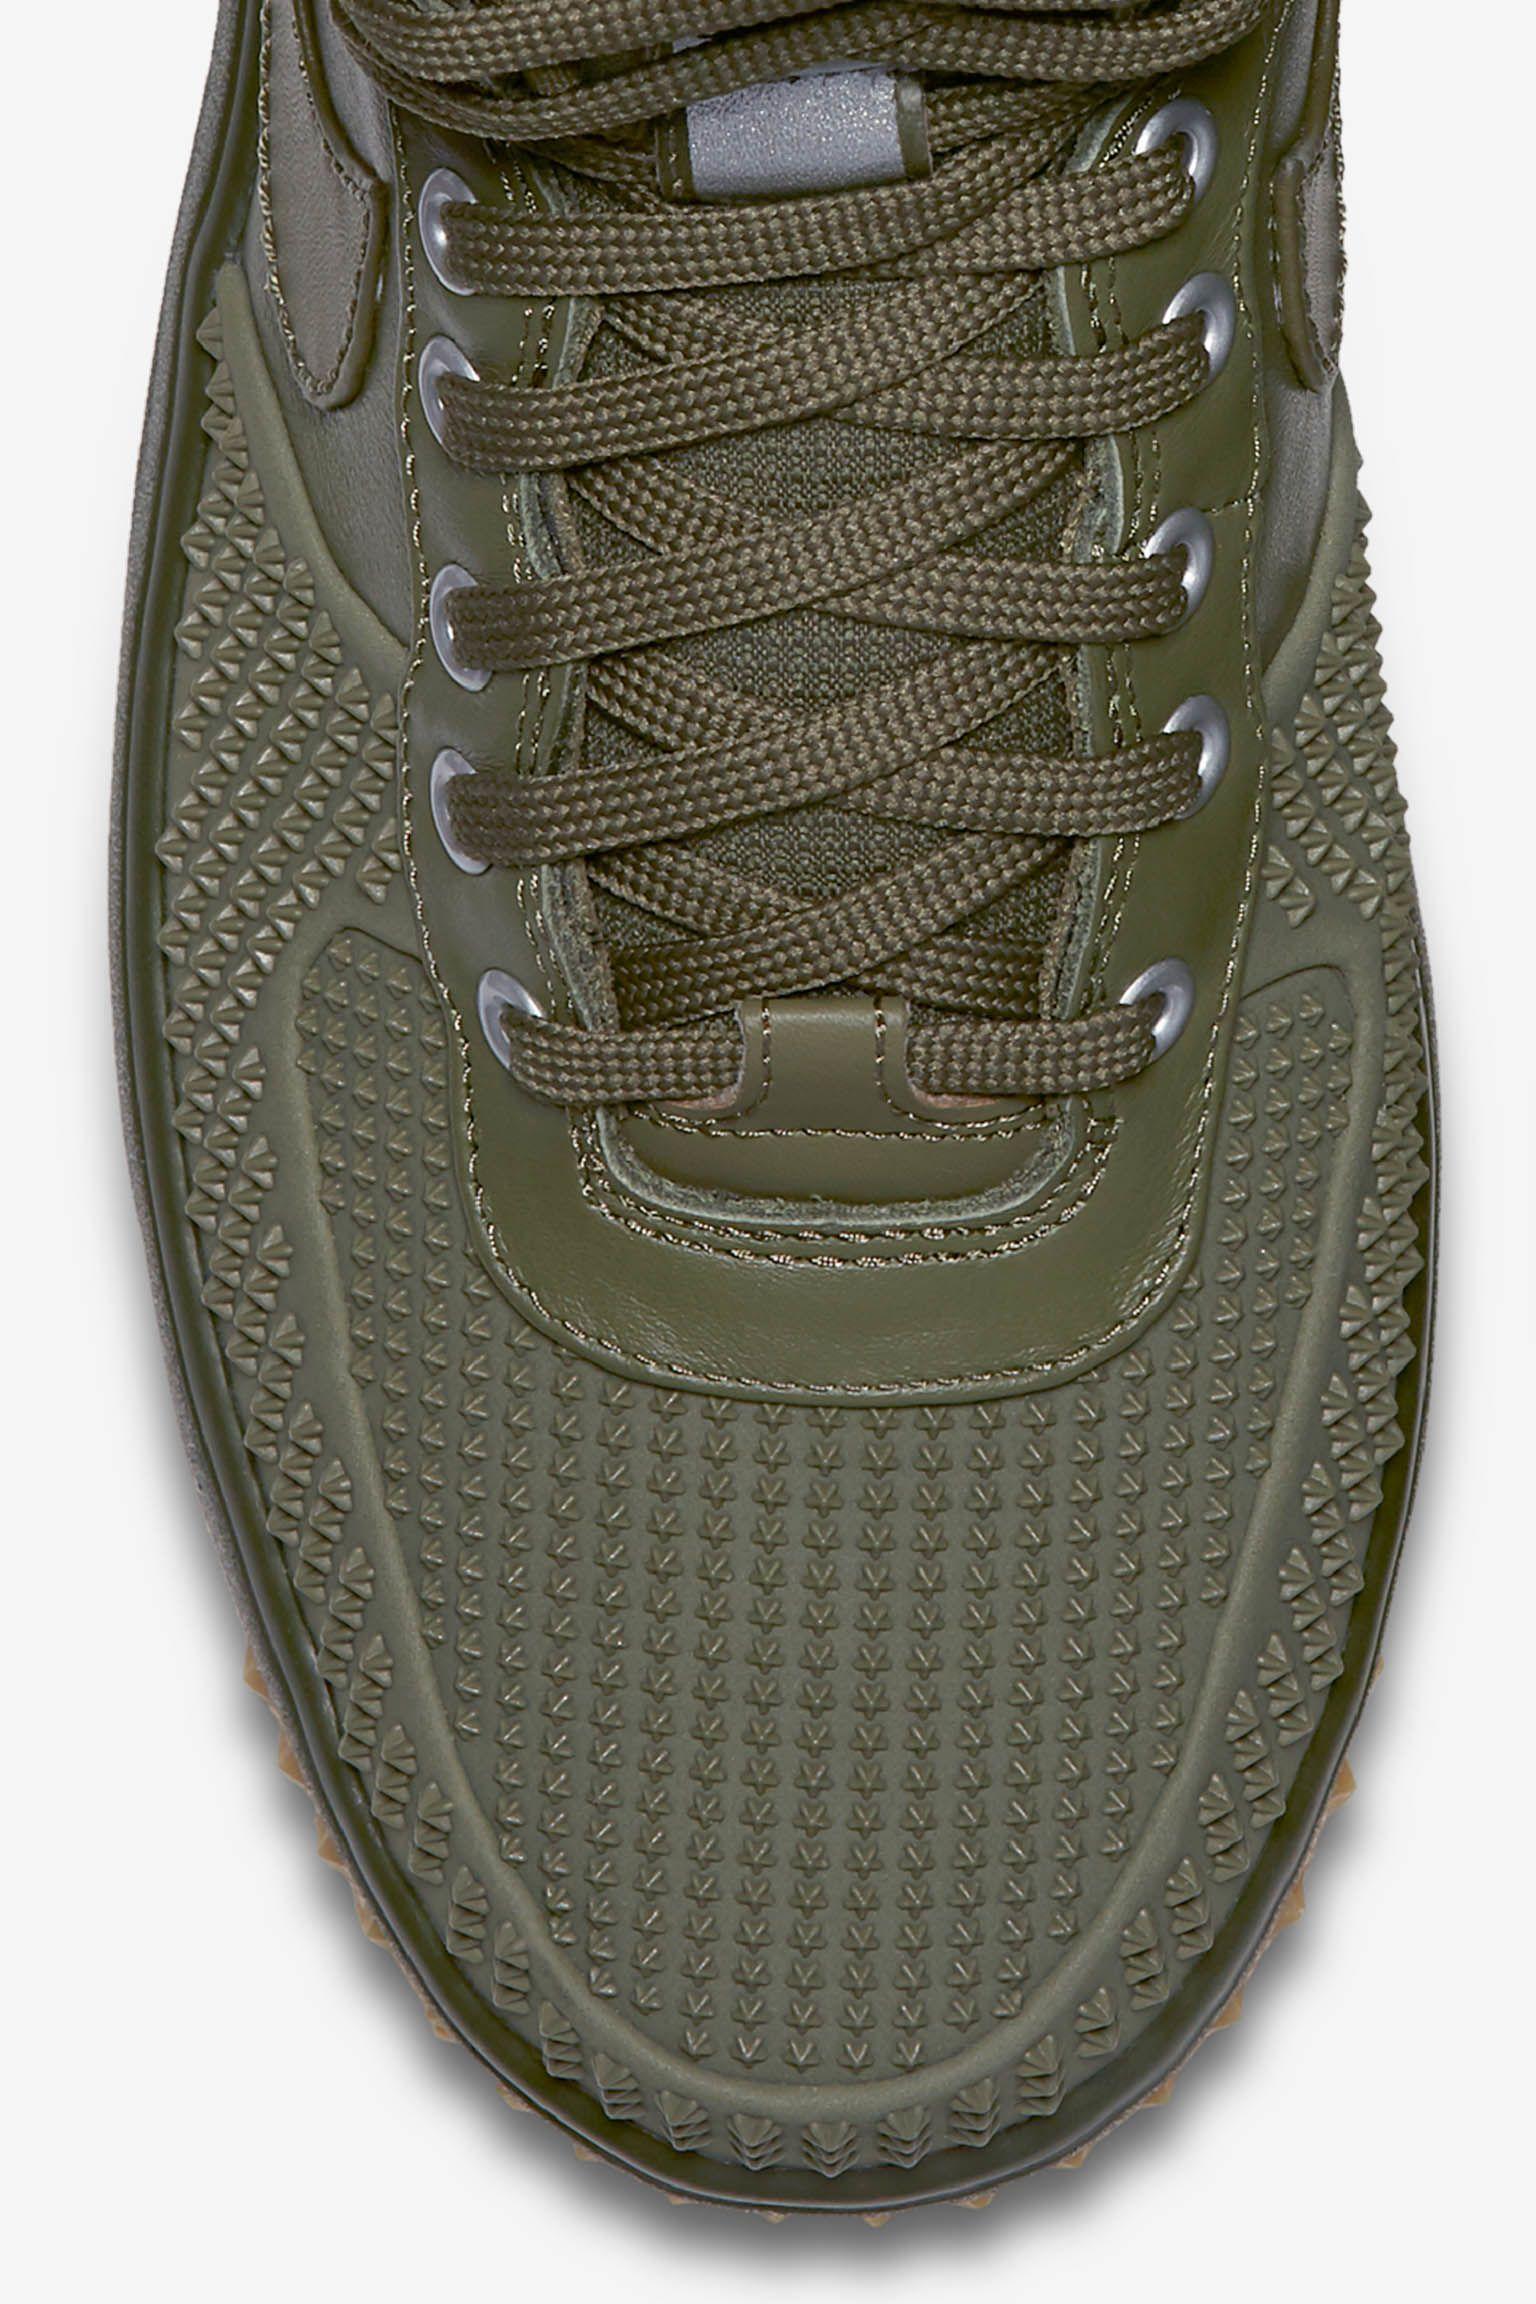 Nike Lunar Force 1 Duckboot 'Medium Olive & Gum'